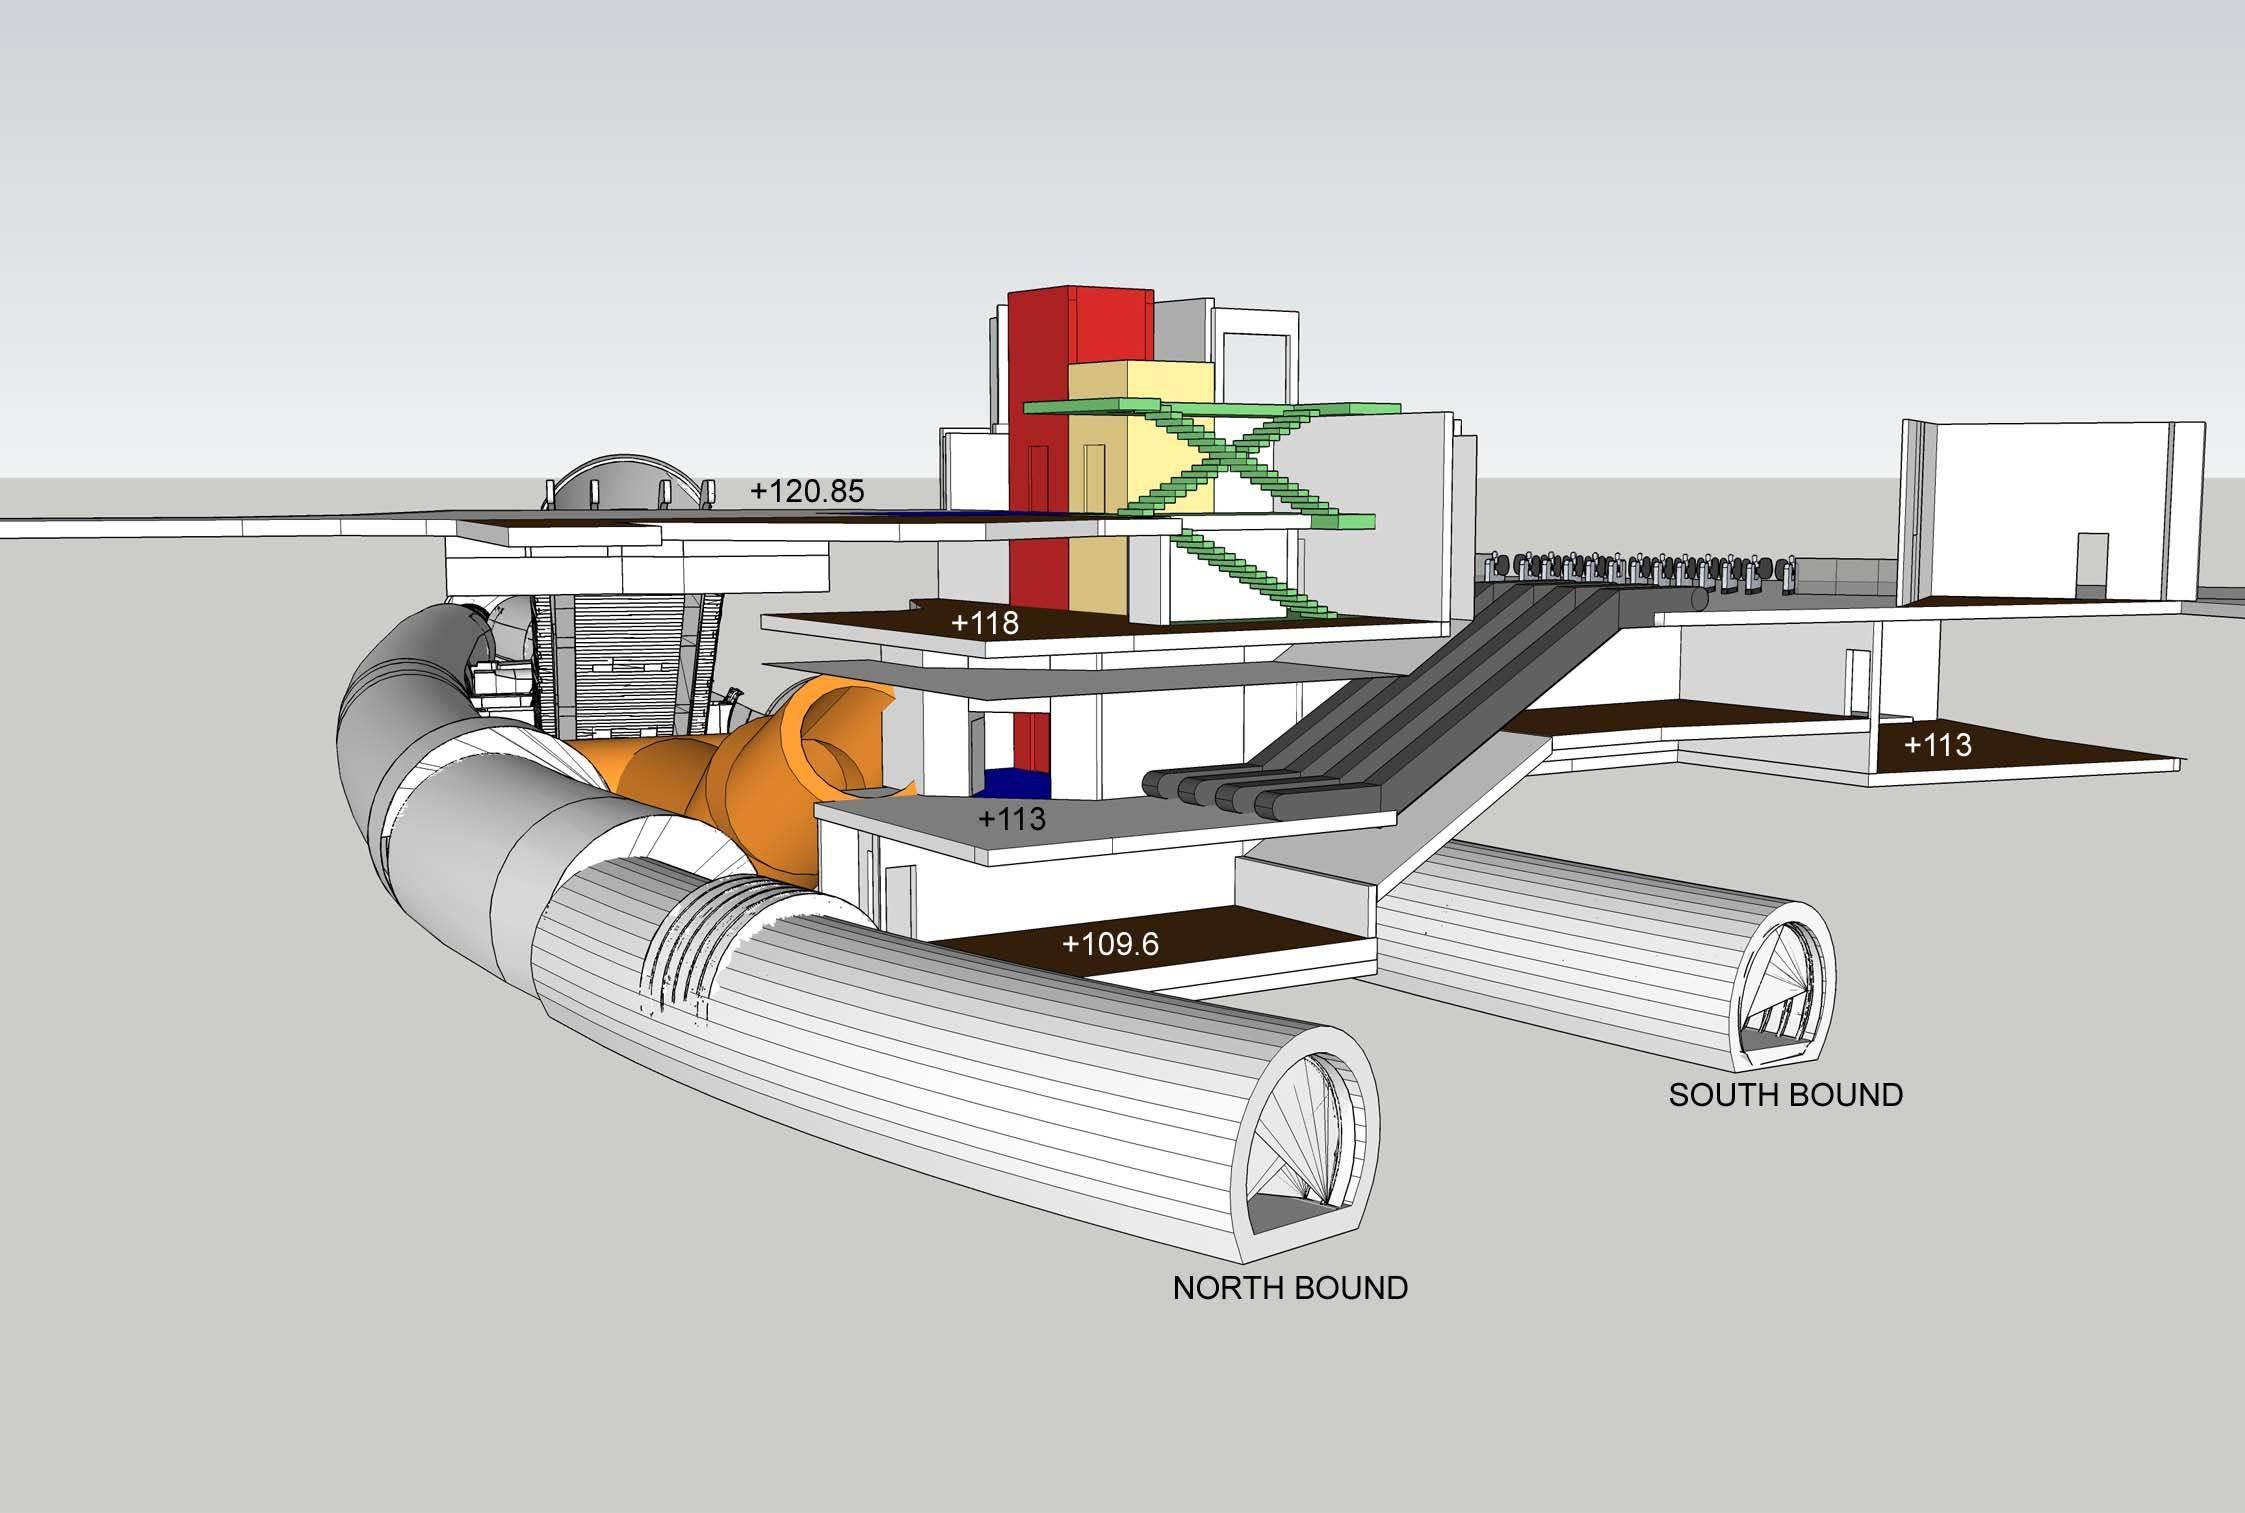 Paddington Bakerloo Line Station Upgrade